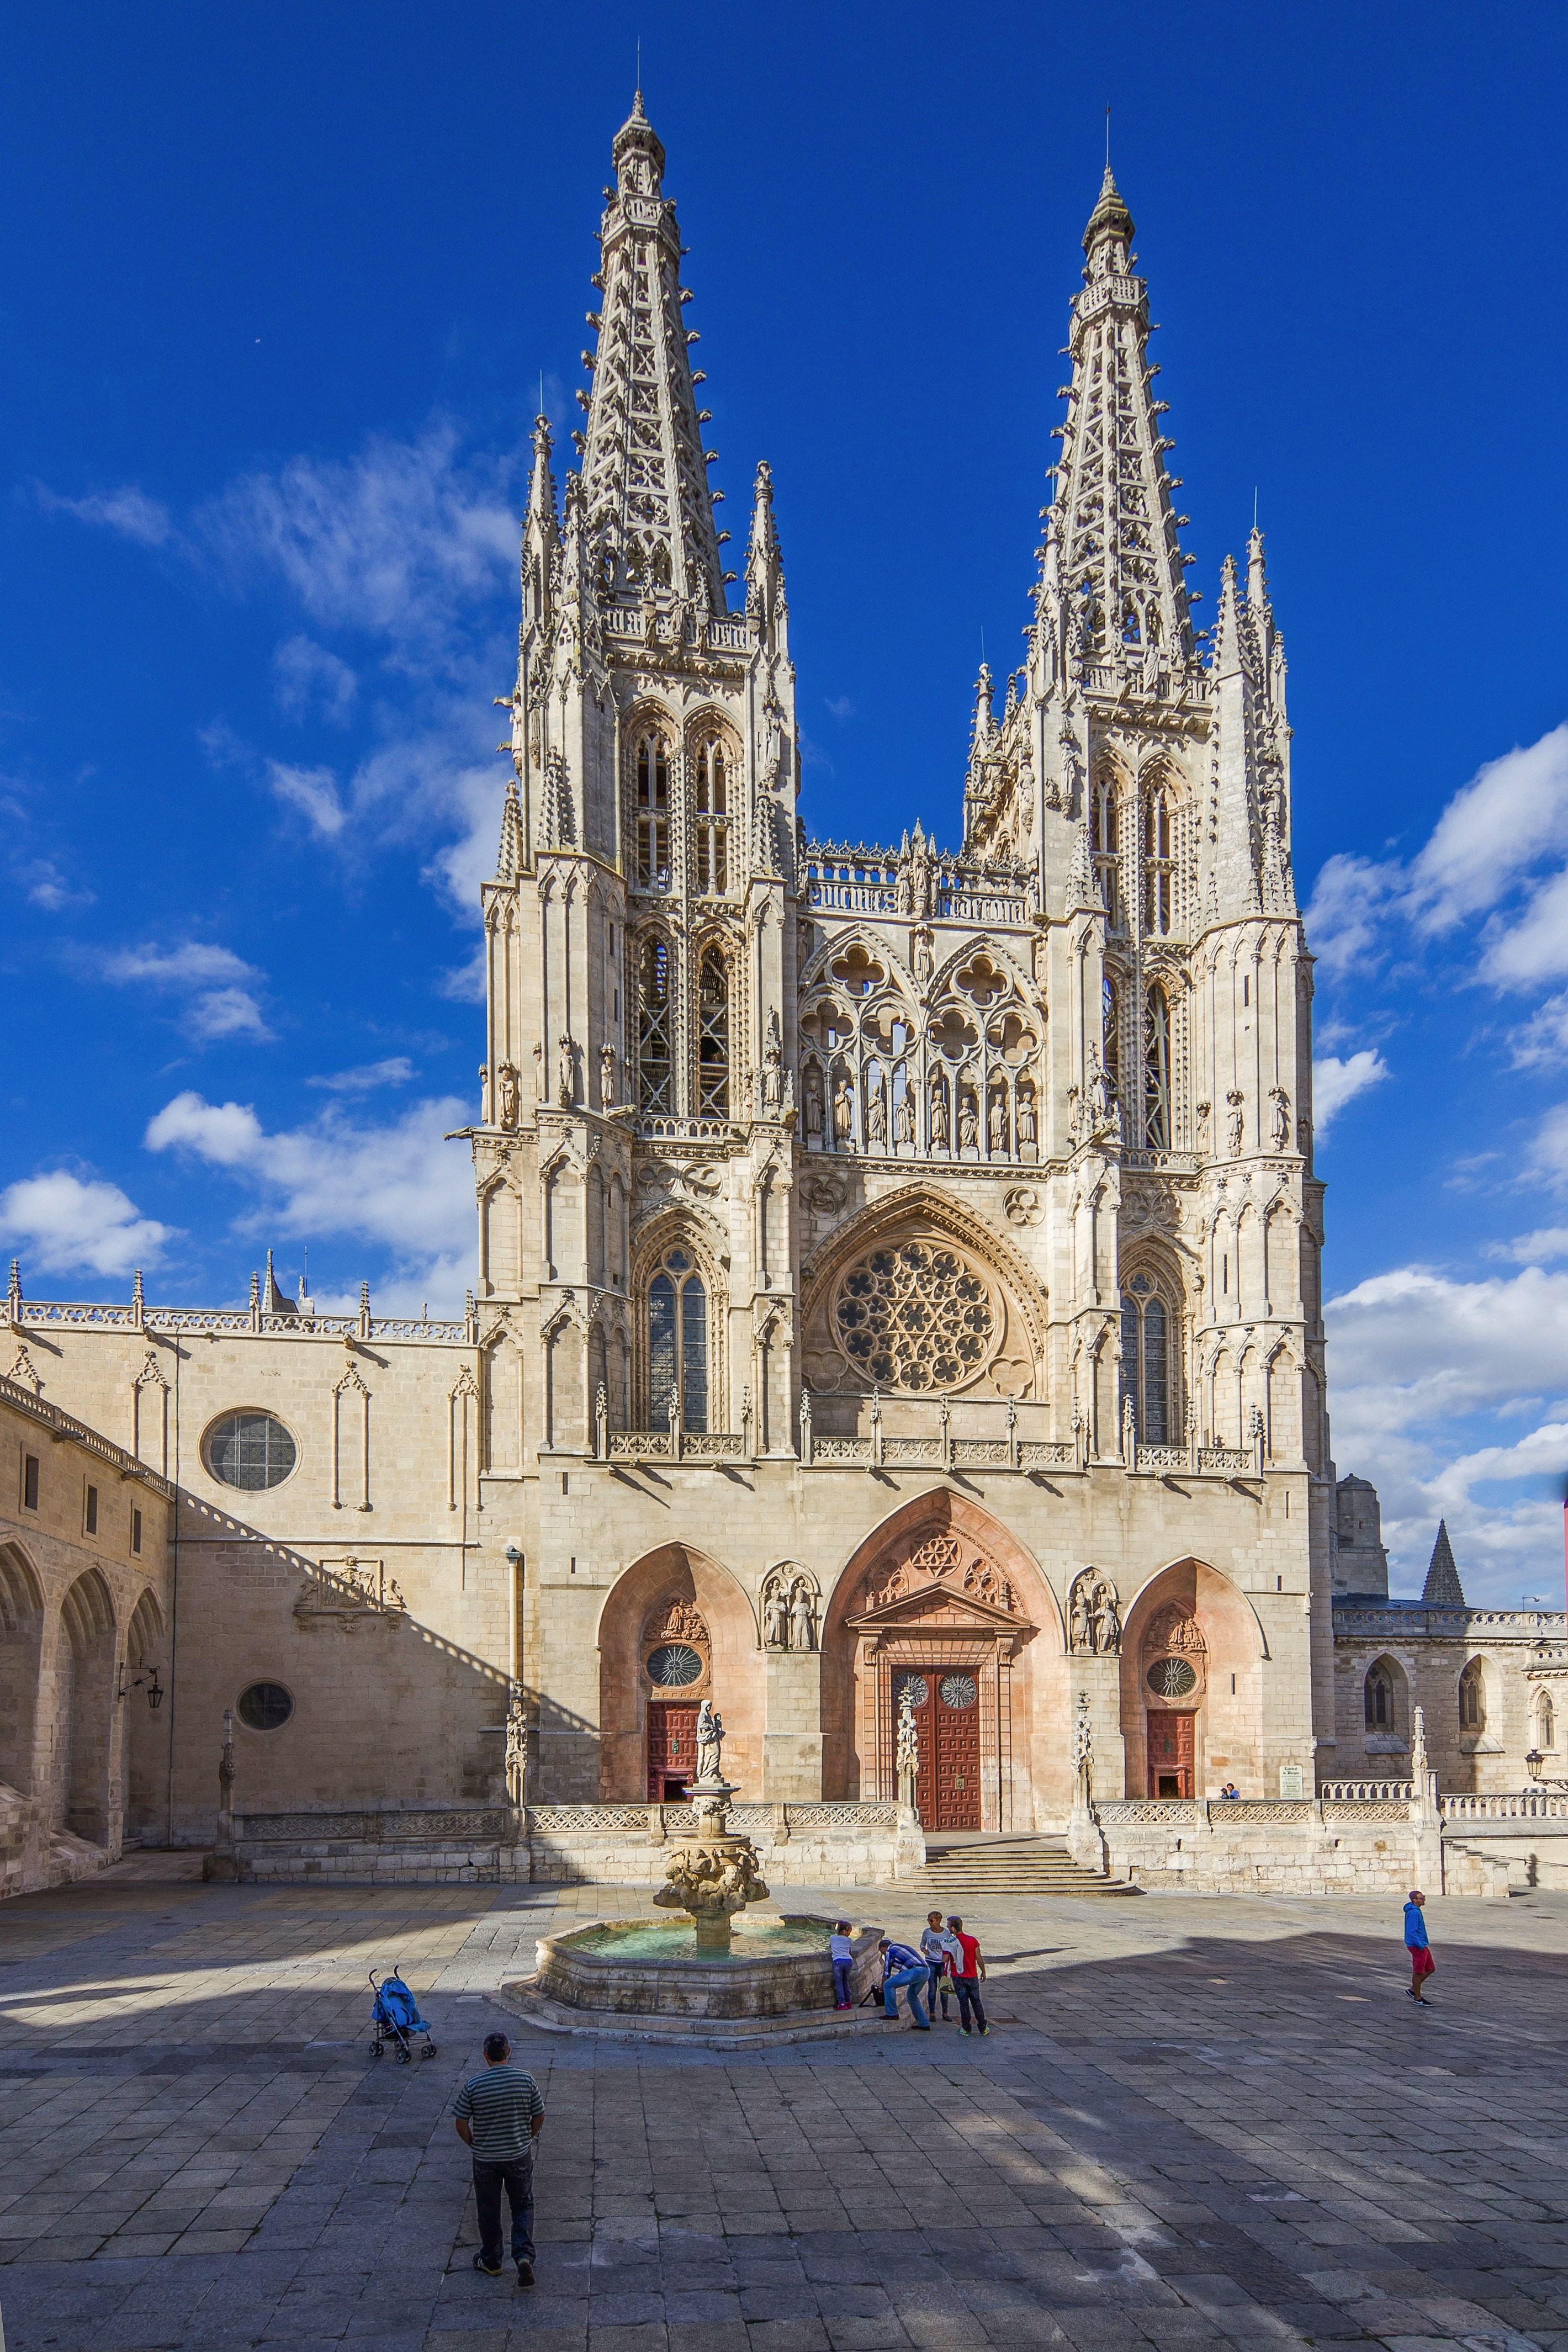 Depiction of Catedral de Burgos